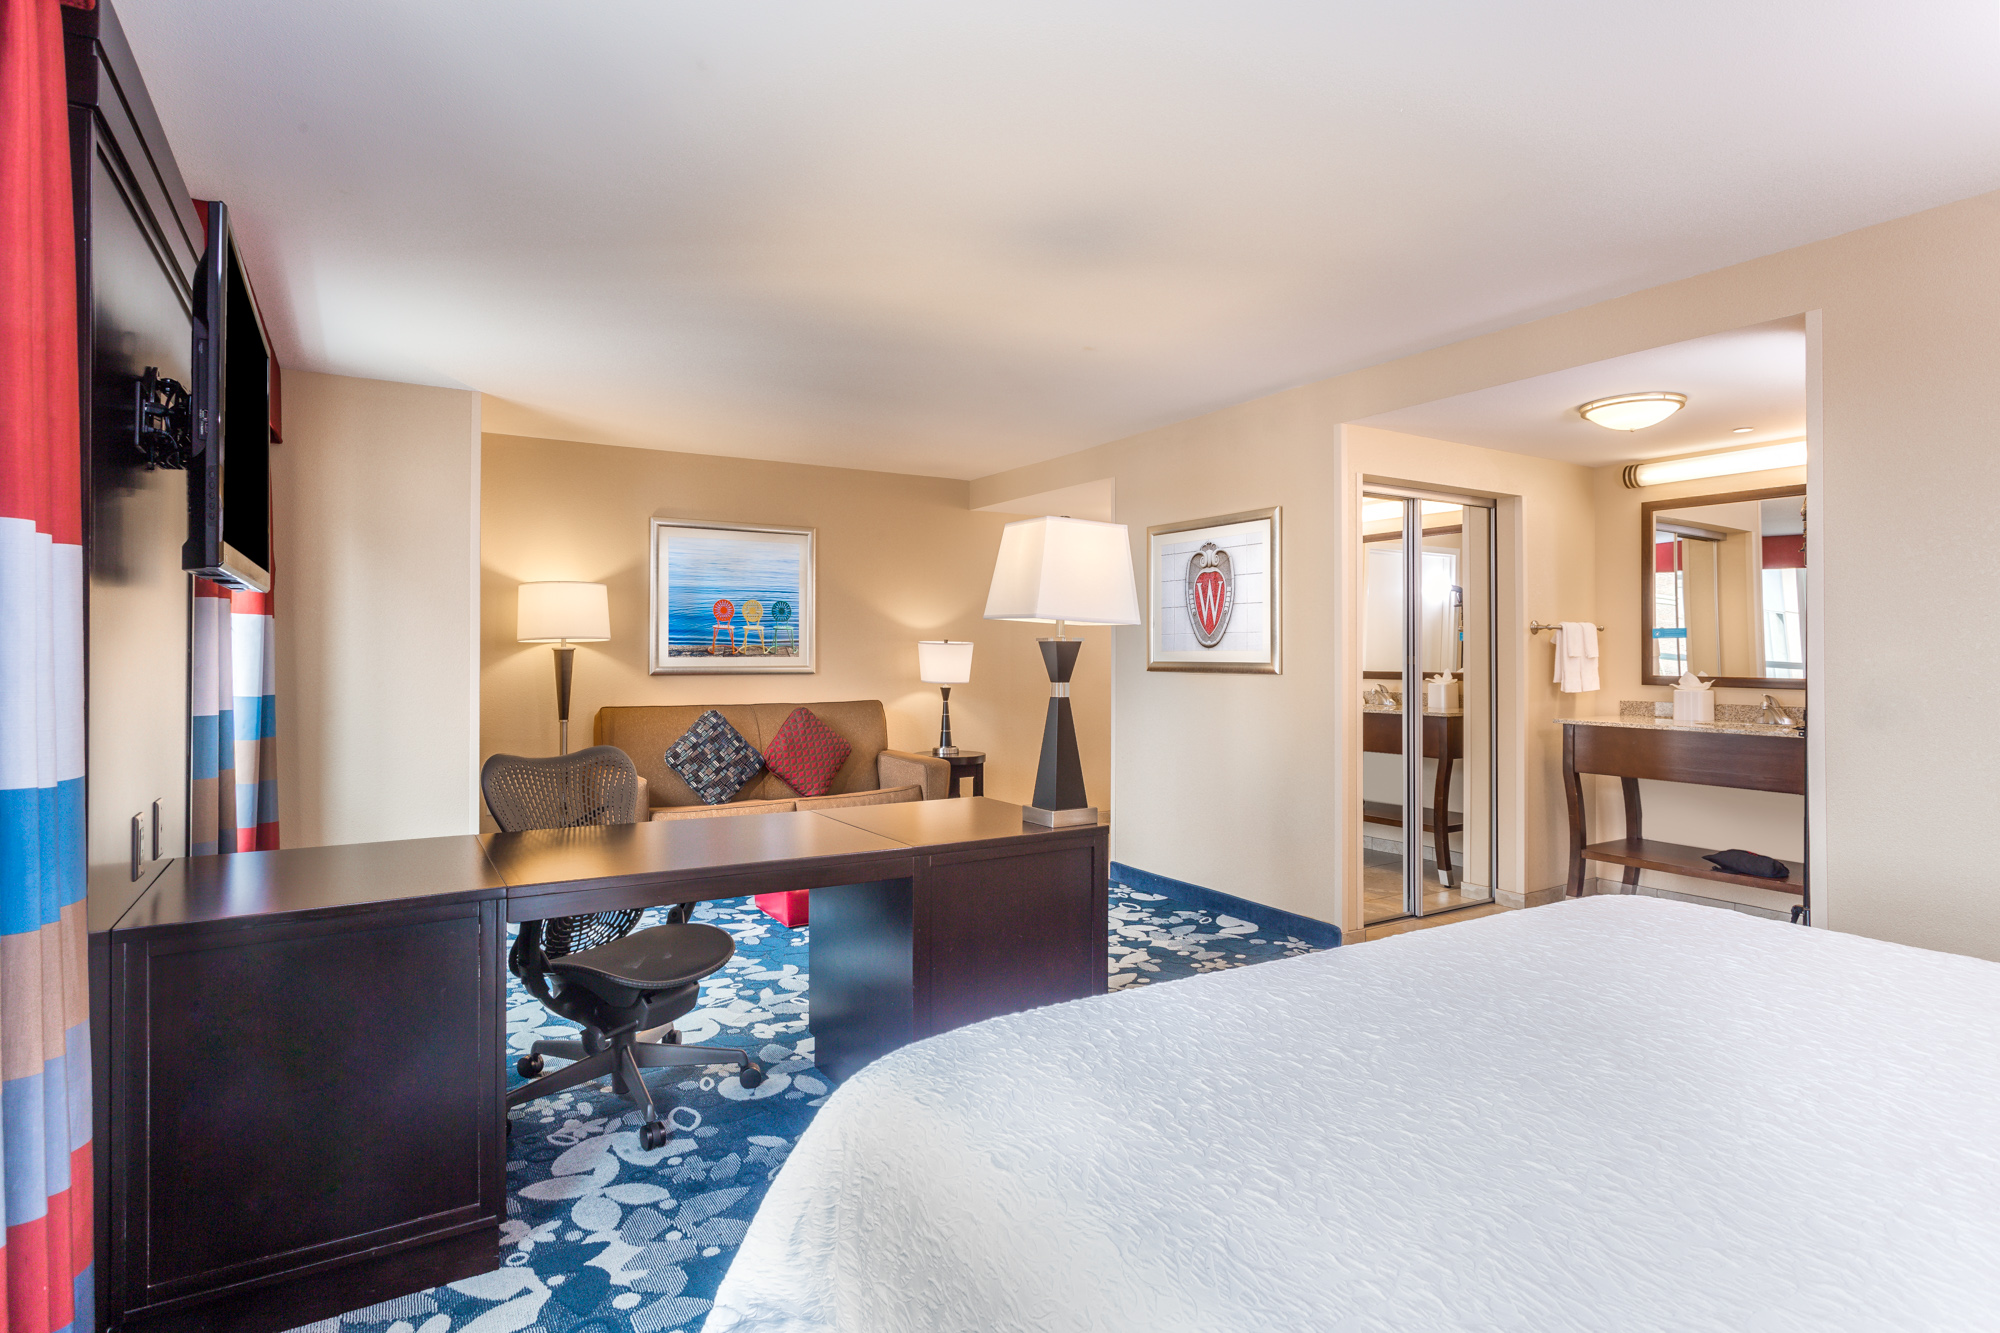 https://www.hotelsbyday.com/_data/default-hotel_image/2/13098/hampton-inn-msnbjhx-downtown-madison-wi-king-studio-room-836-9631-low-res.jpg